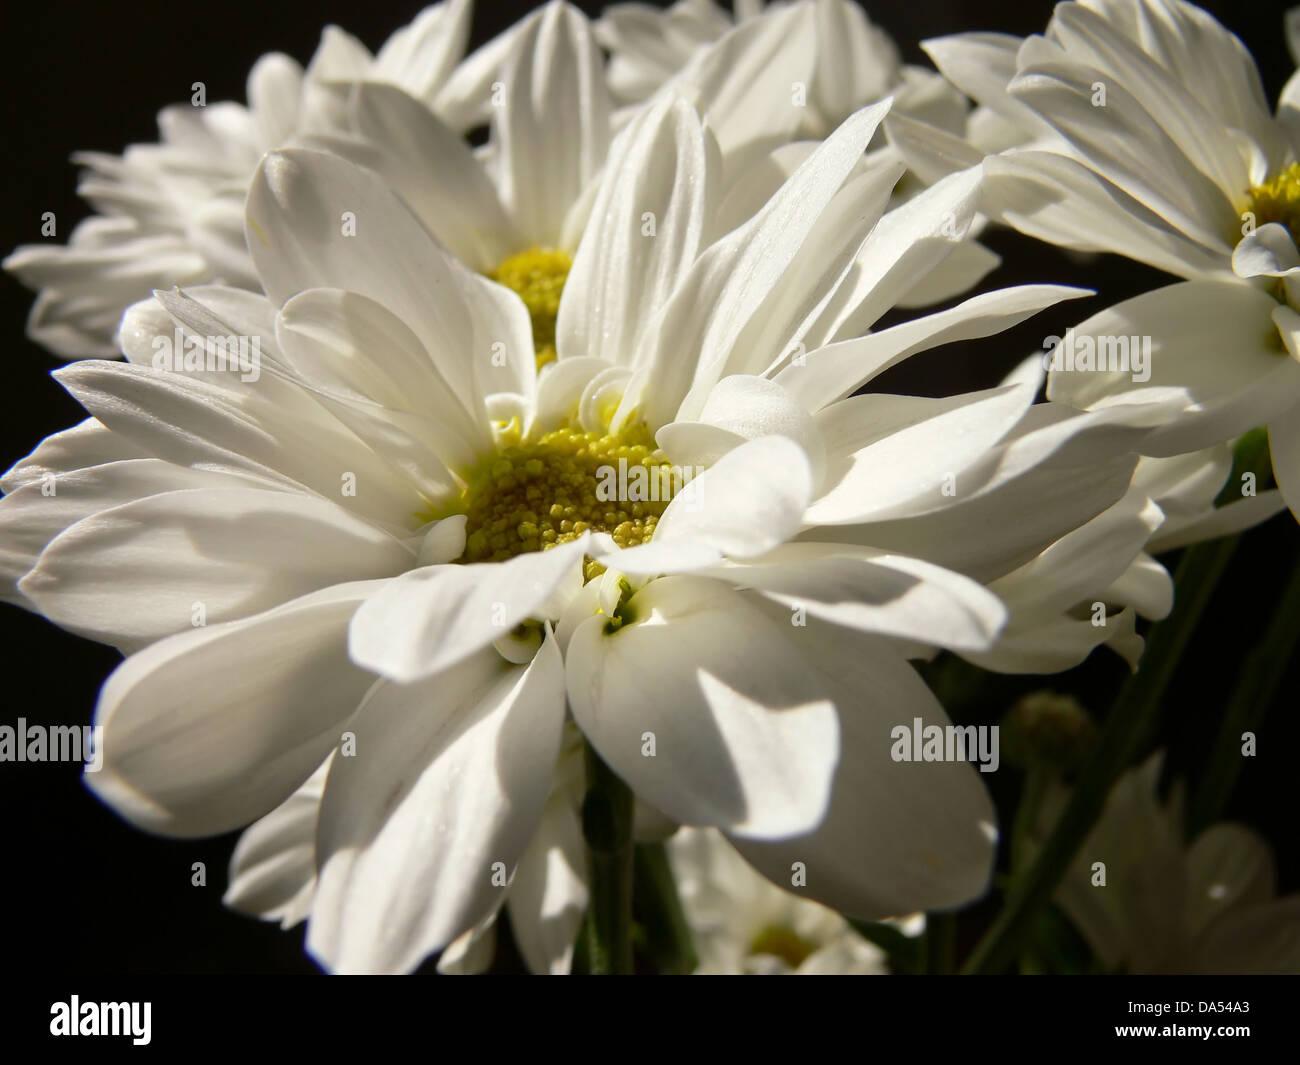 White chrysanthemum flowers stock photos white chrysanthemum white chrysanthemum flowers stock image mightylinksfo